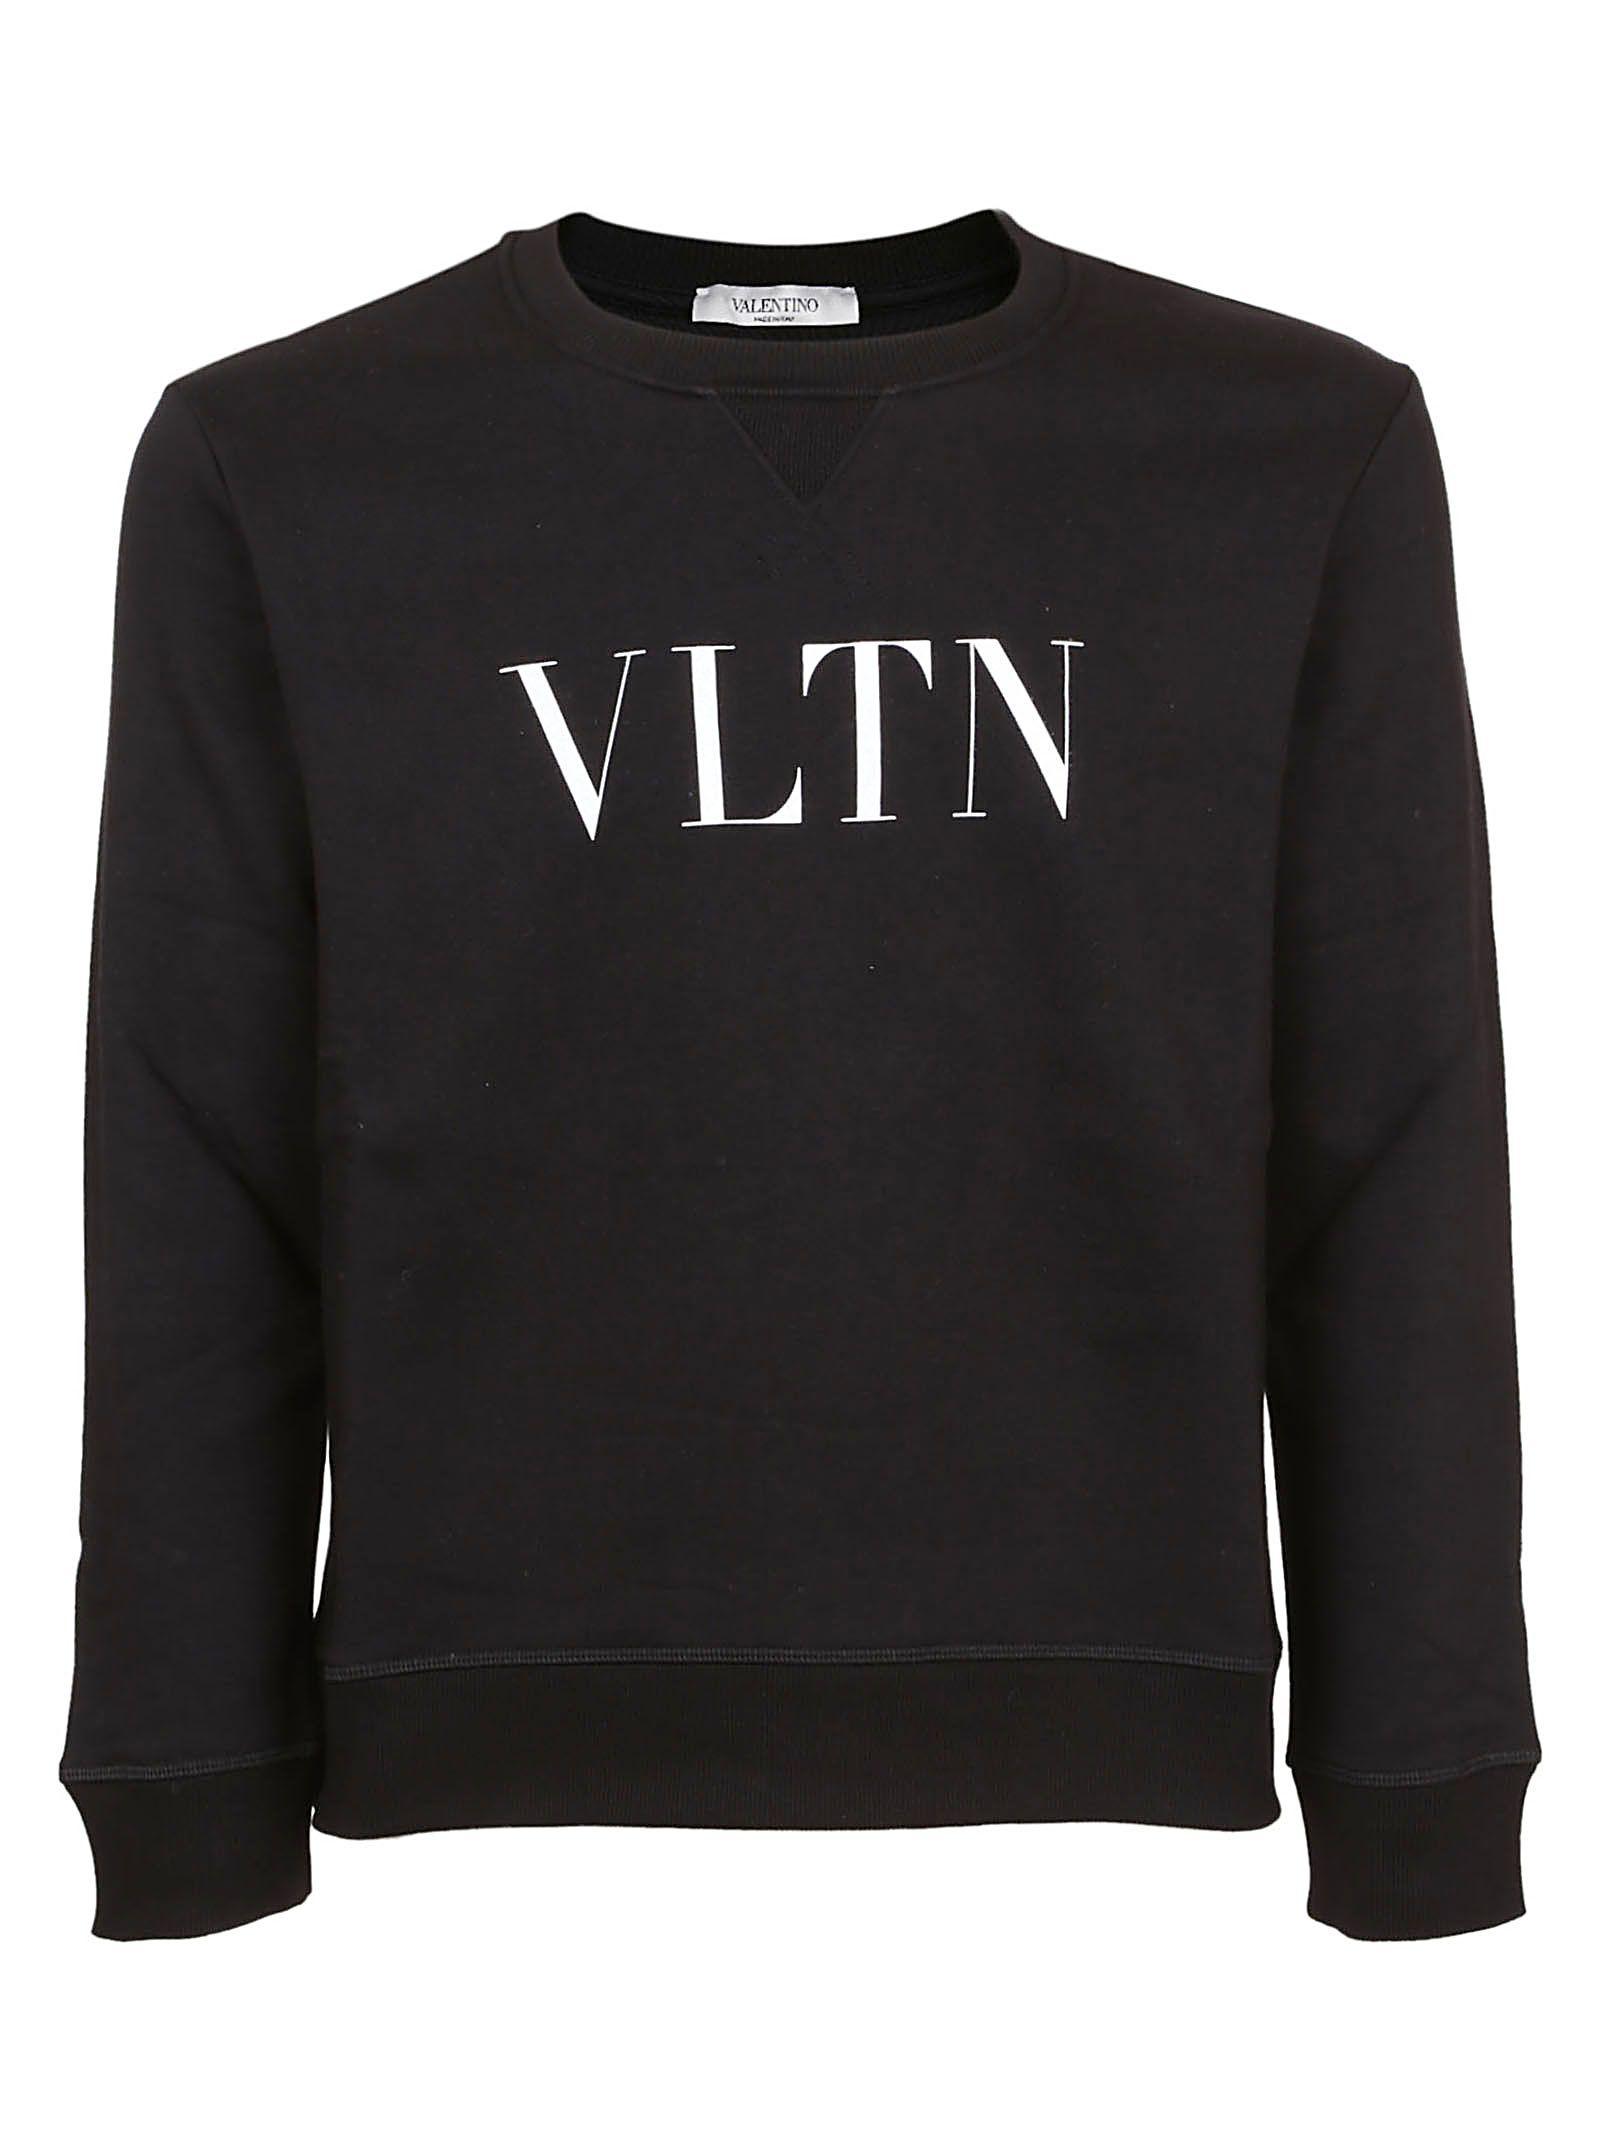 50c334db07629 Valentino Black And White Vltn Sweatshirt In Cotton | ModeSens